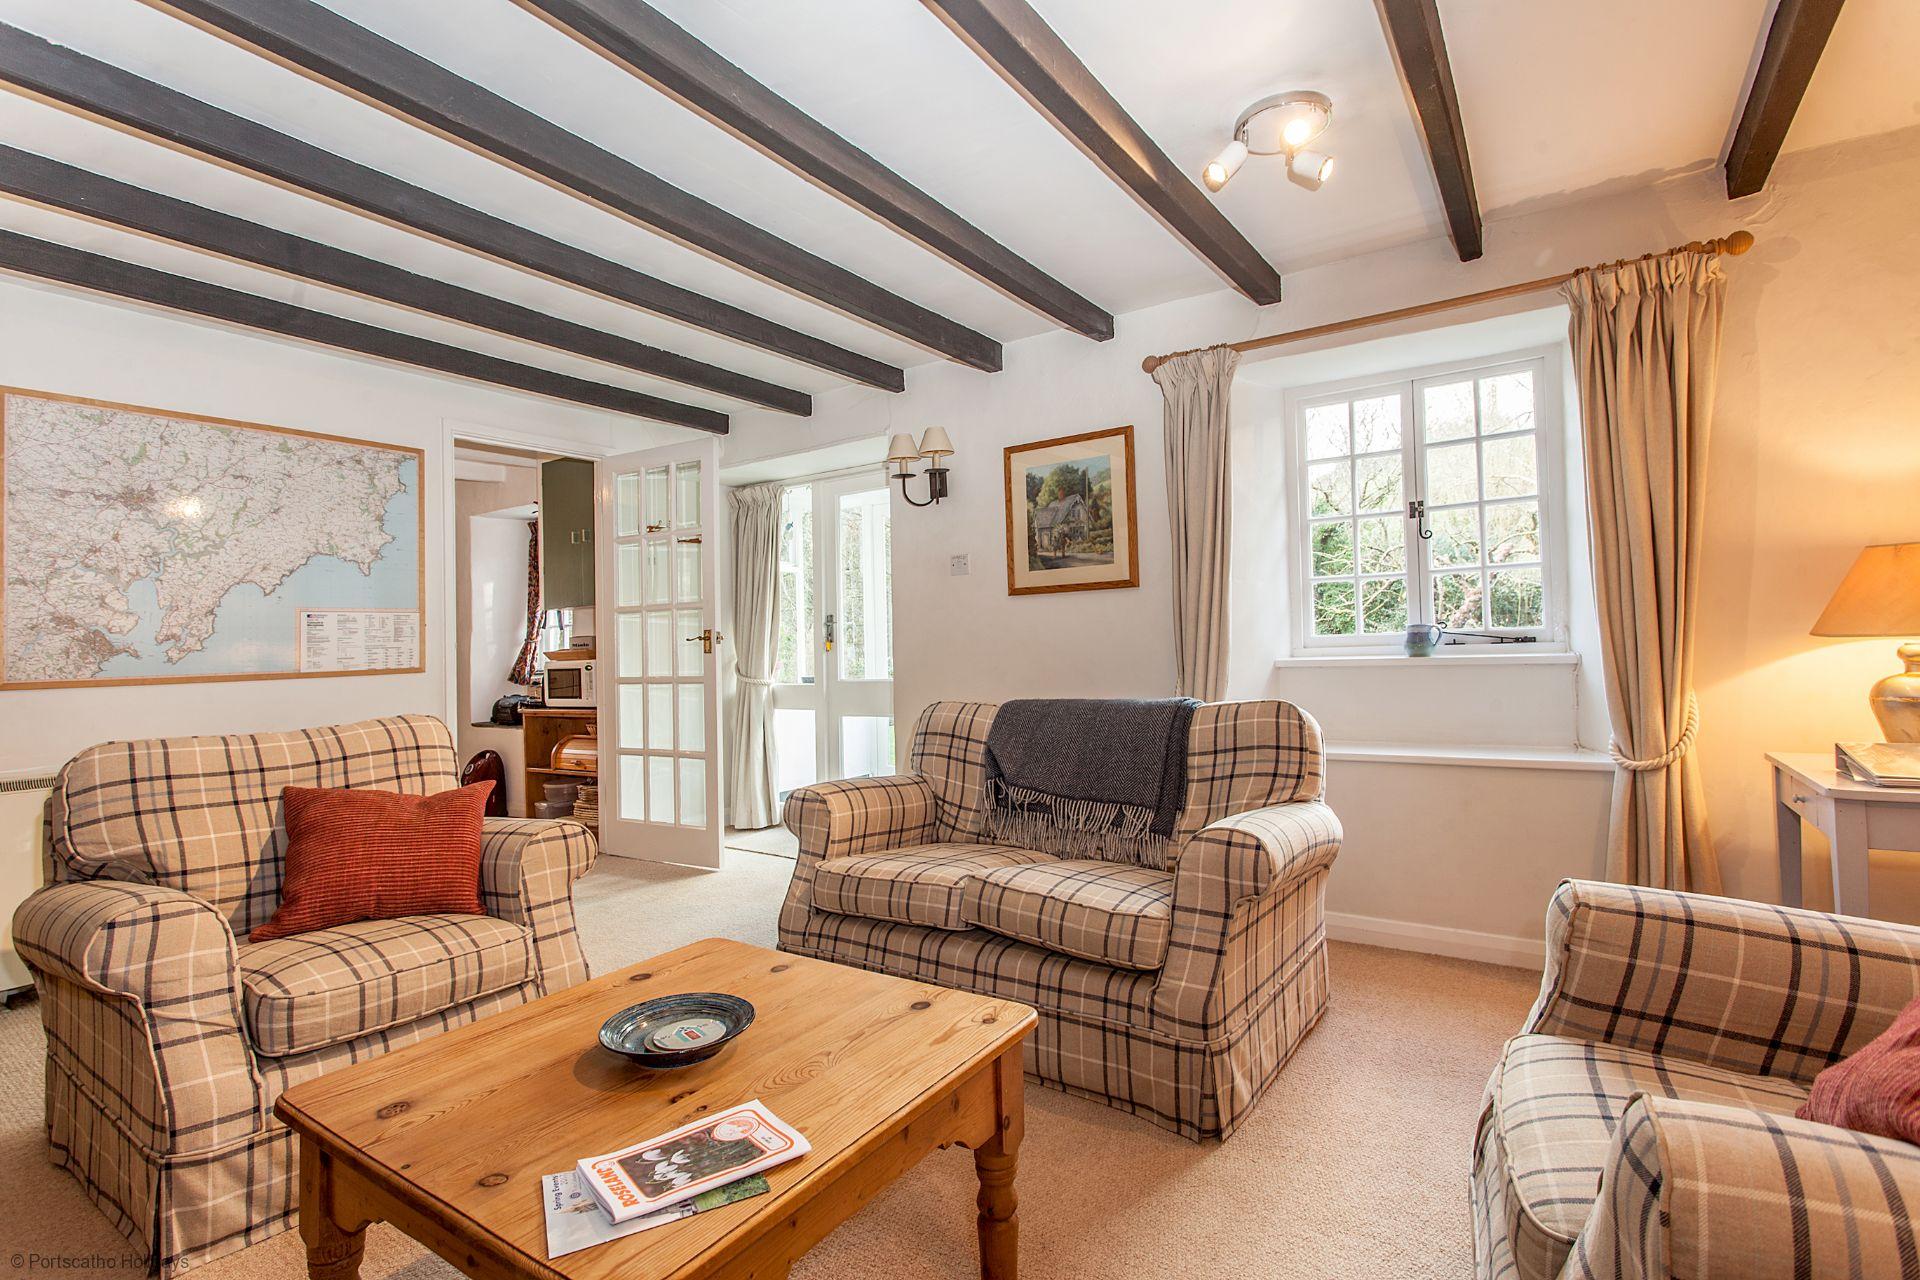 Pedlars; Ruan Lanihorne; Cornwall; Lounge